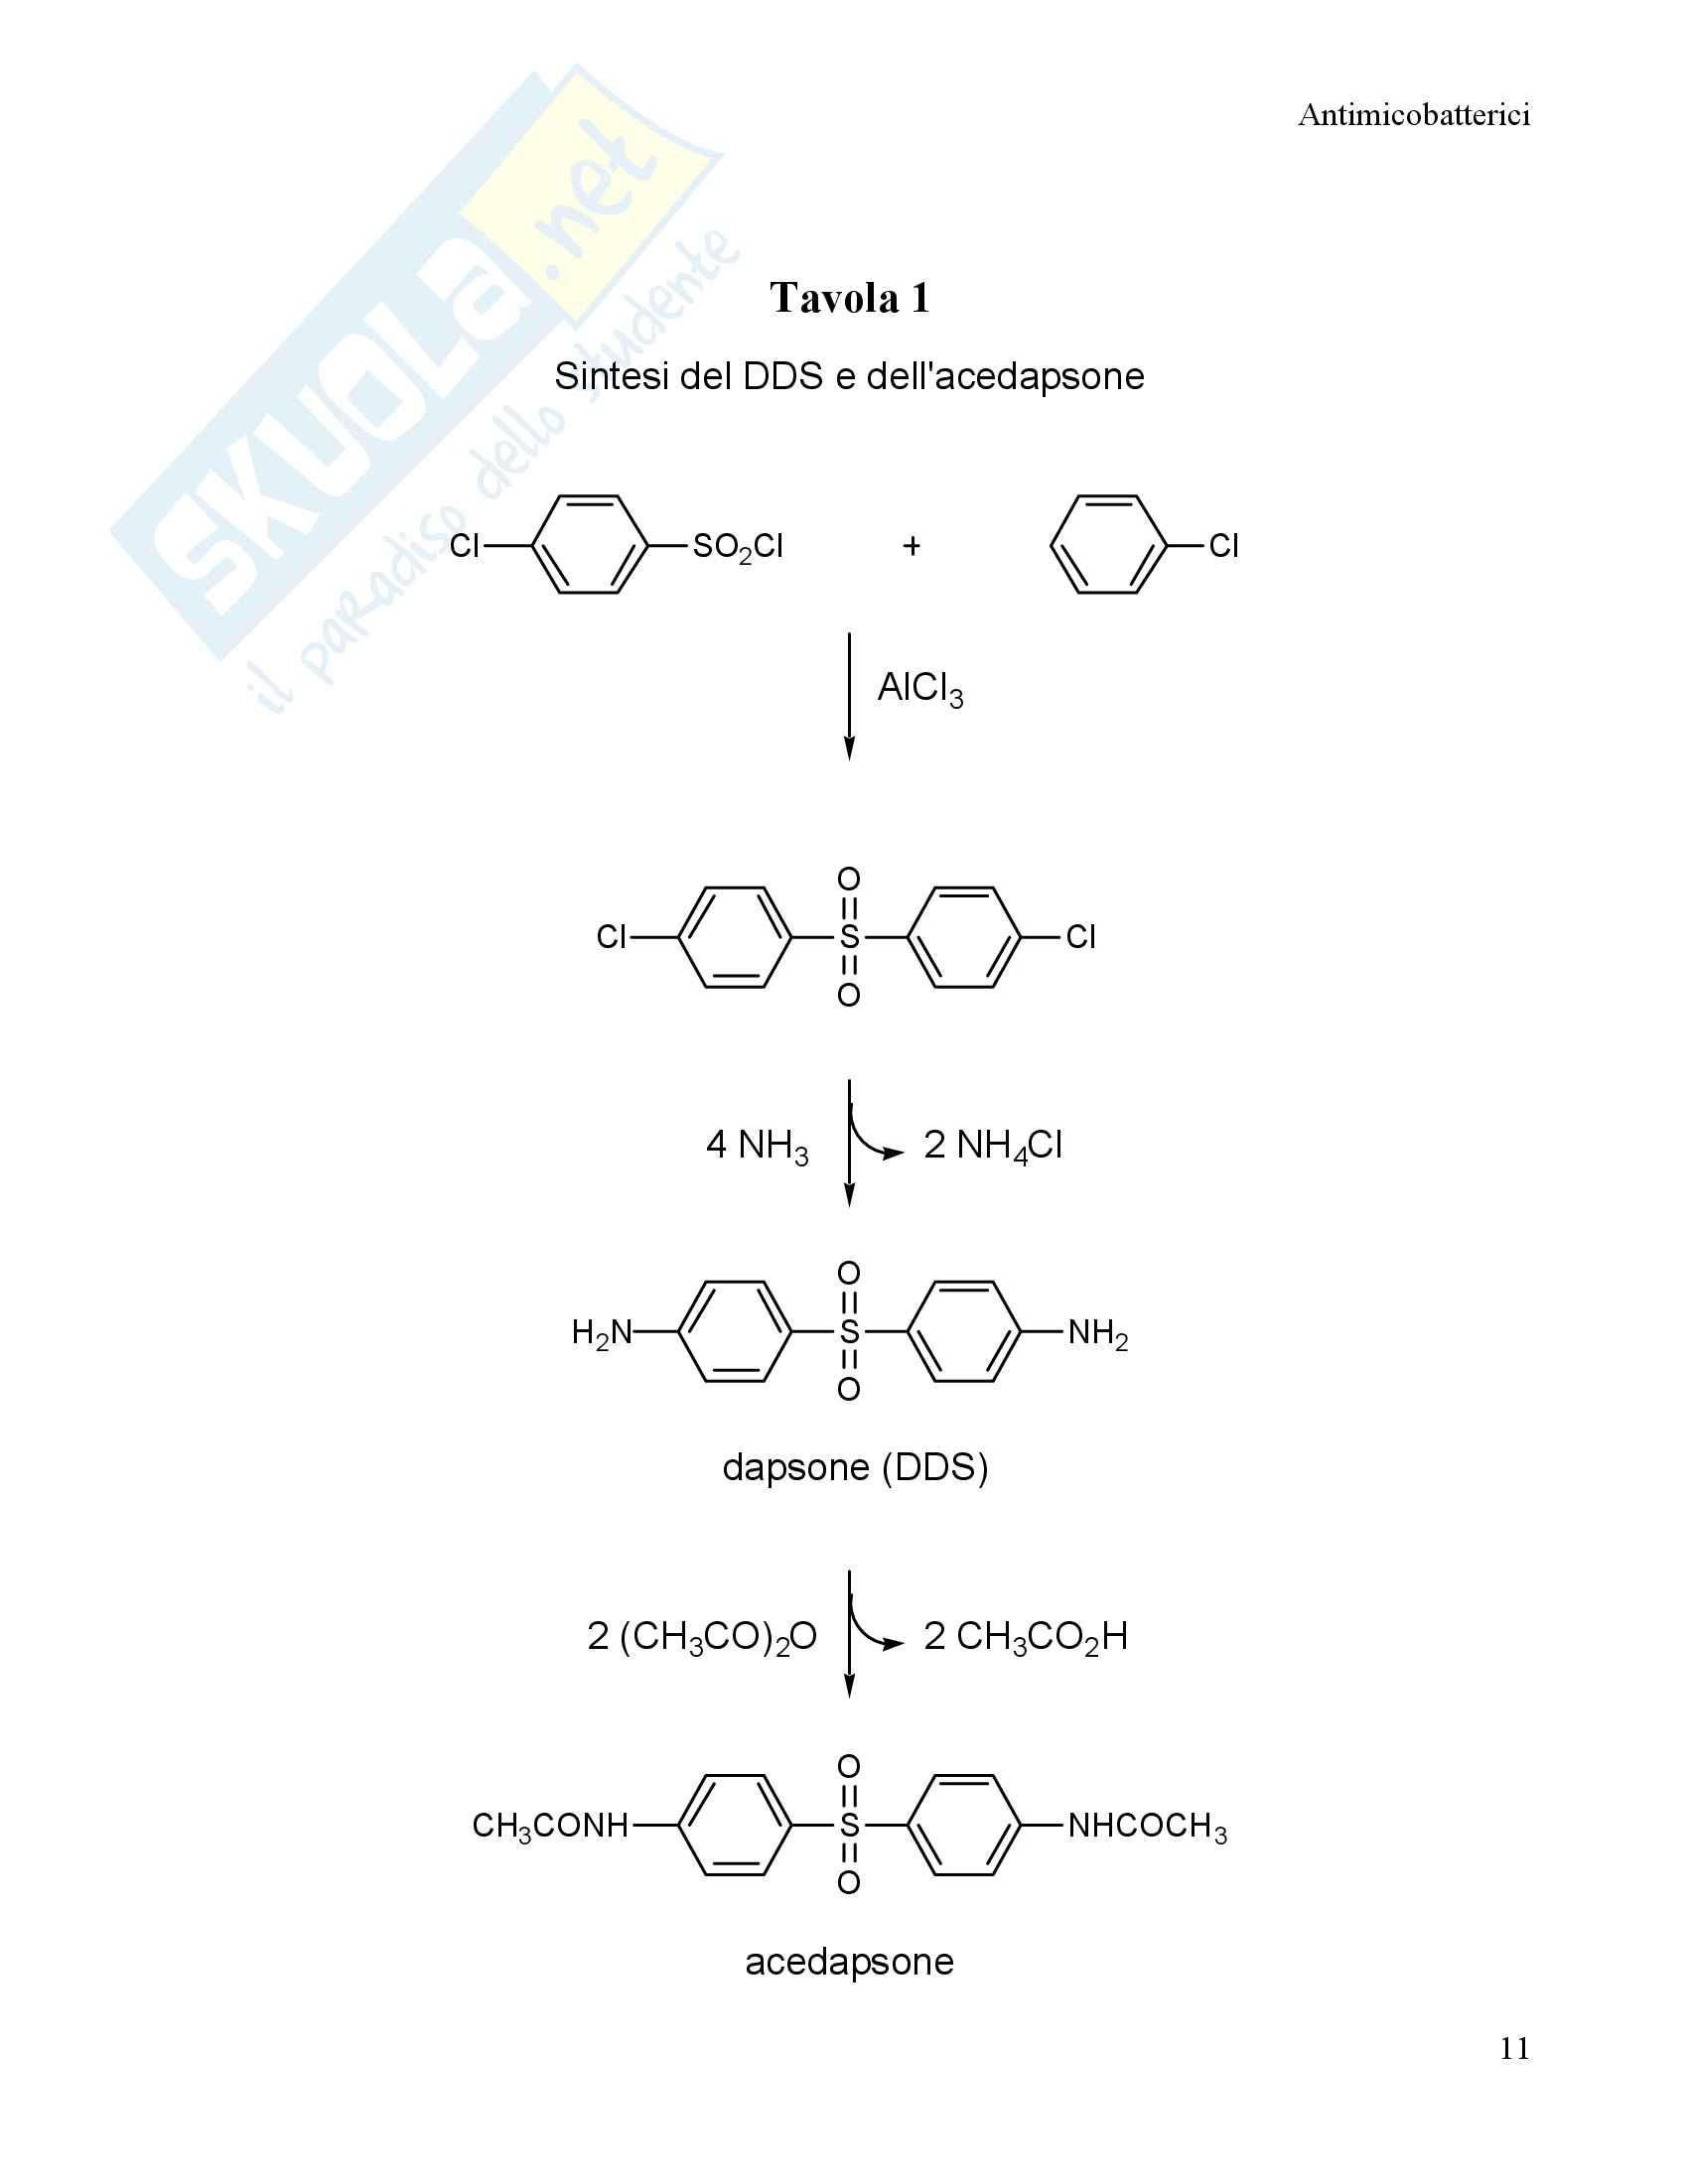 Chimica farmaceutica - farmaci antimicobatterici Pag. 11